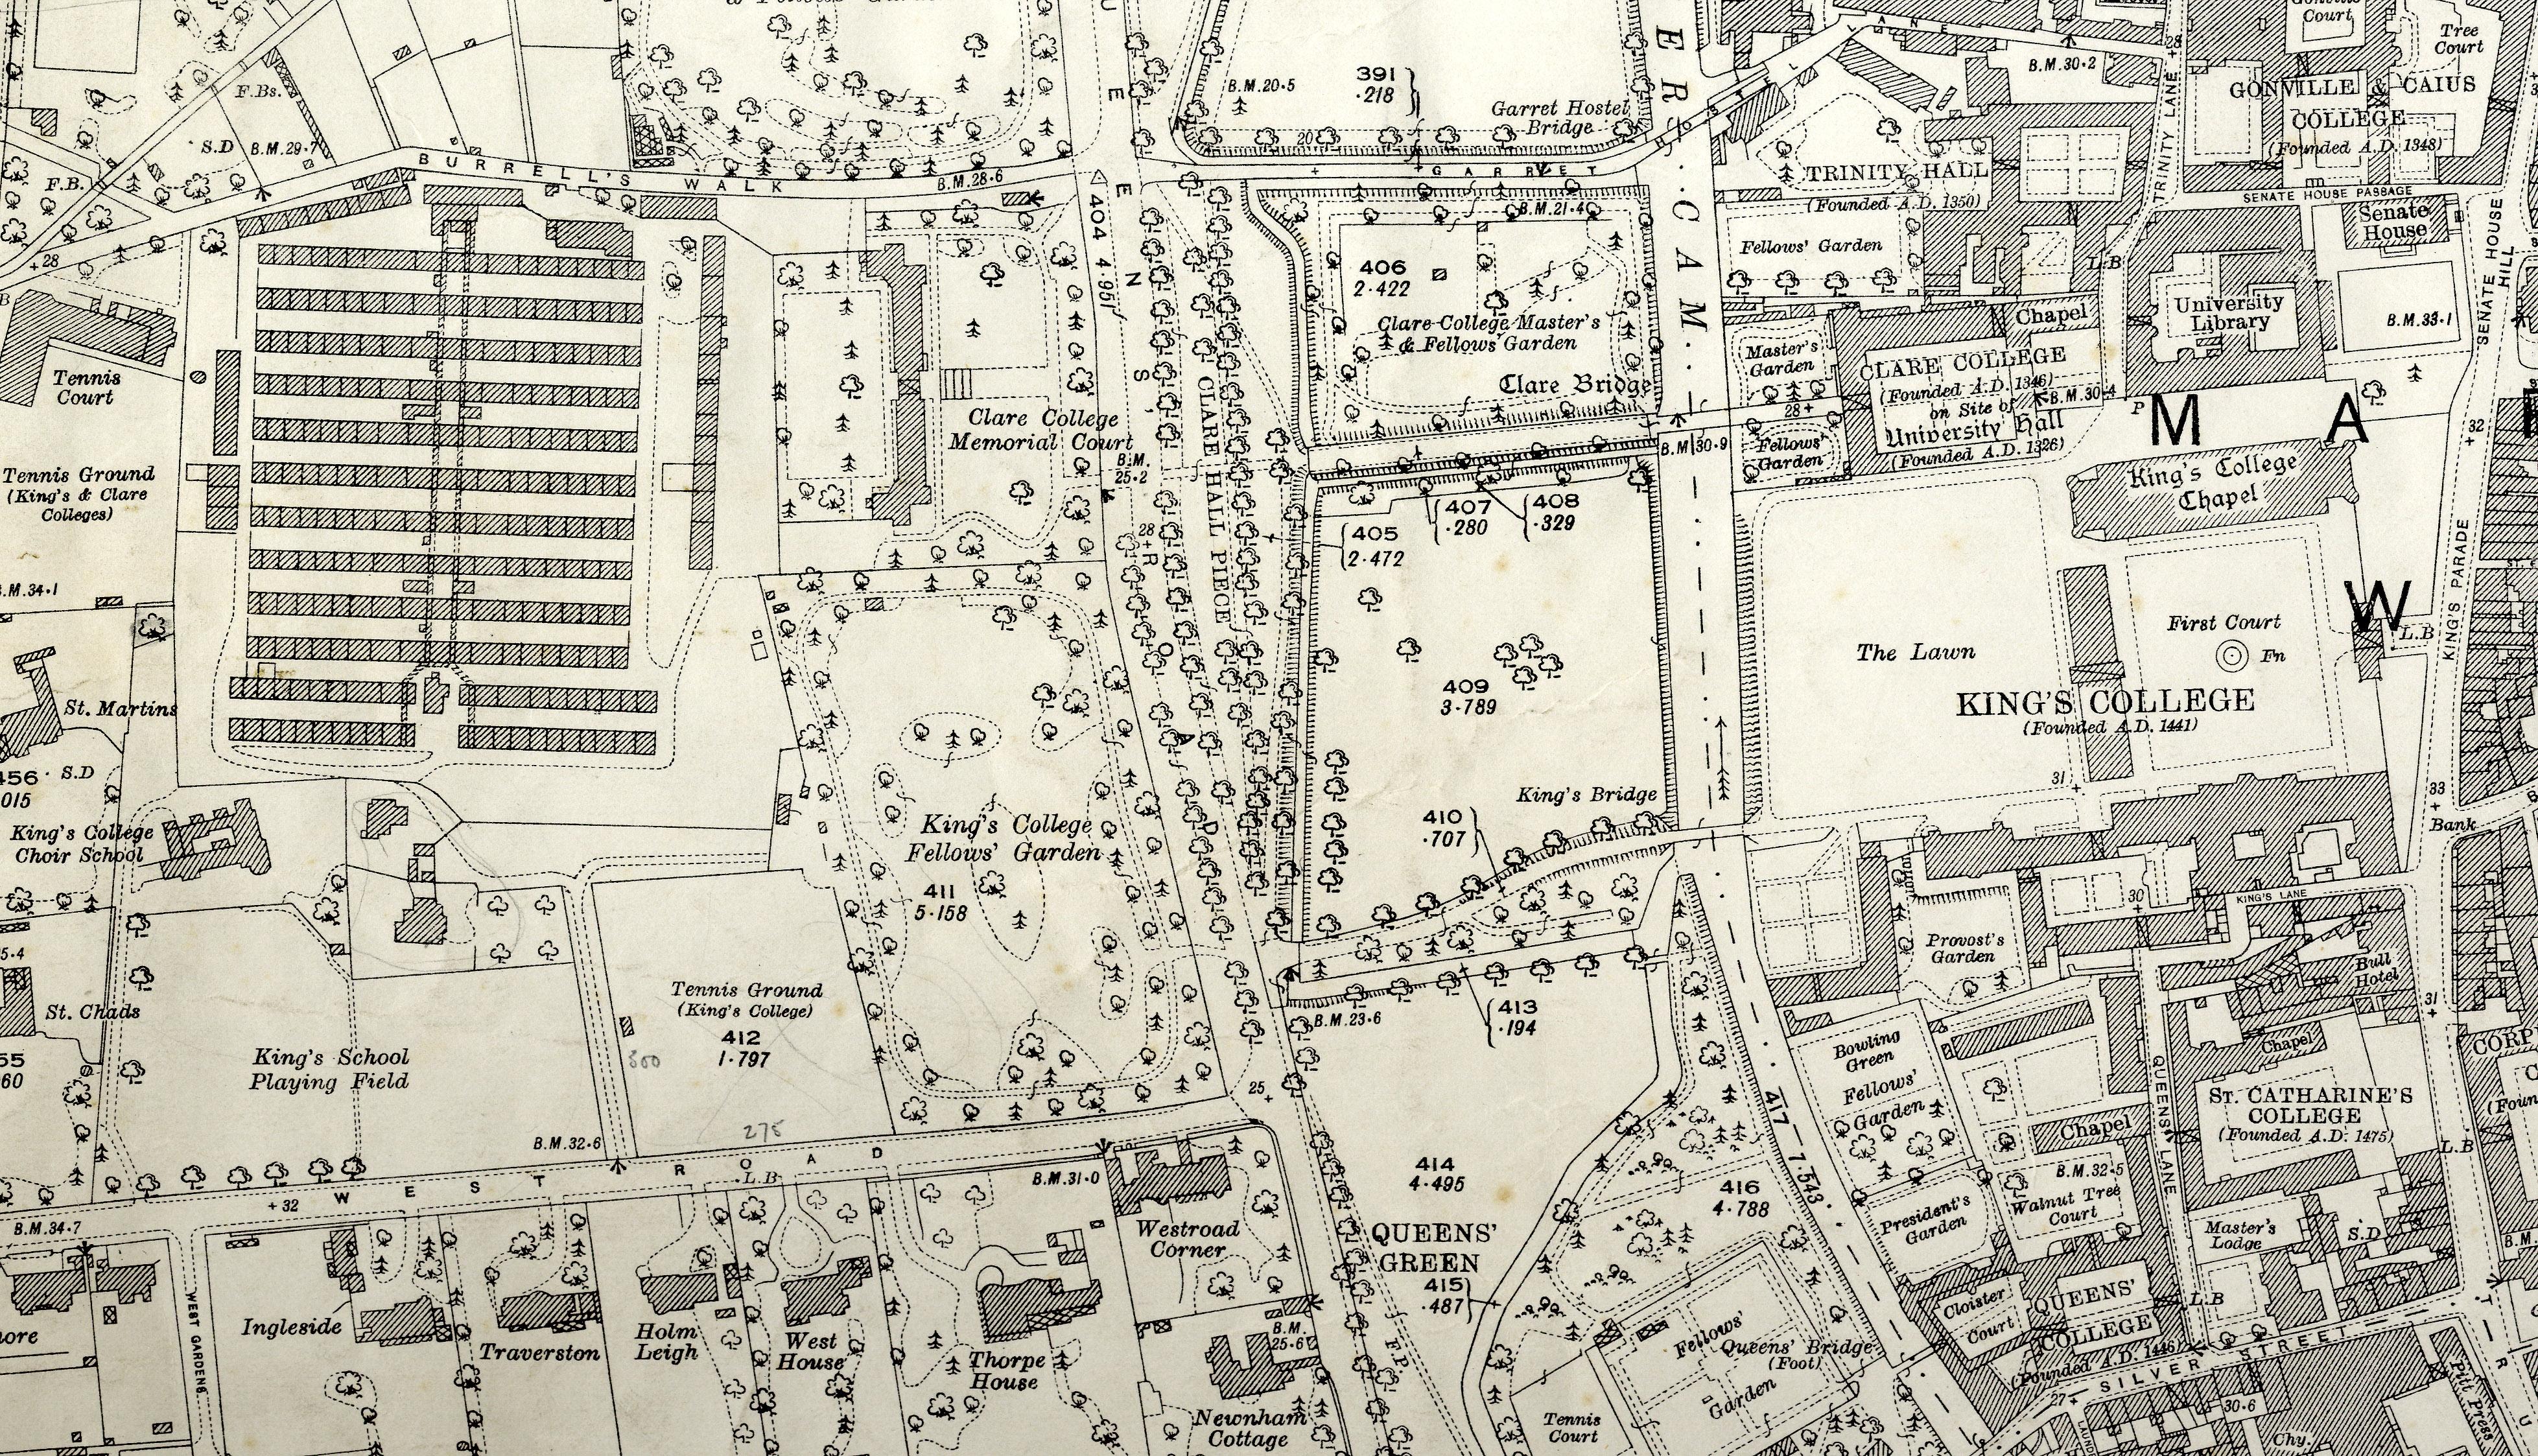 Ordnance Survey map, 1927 (CAM/200)